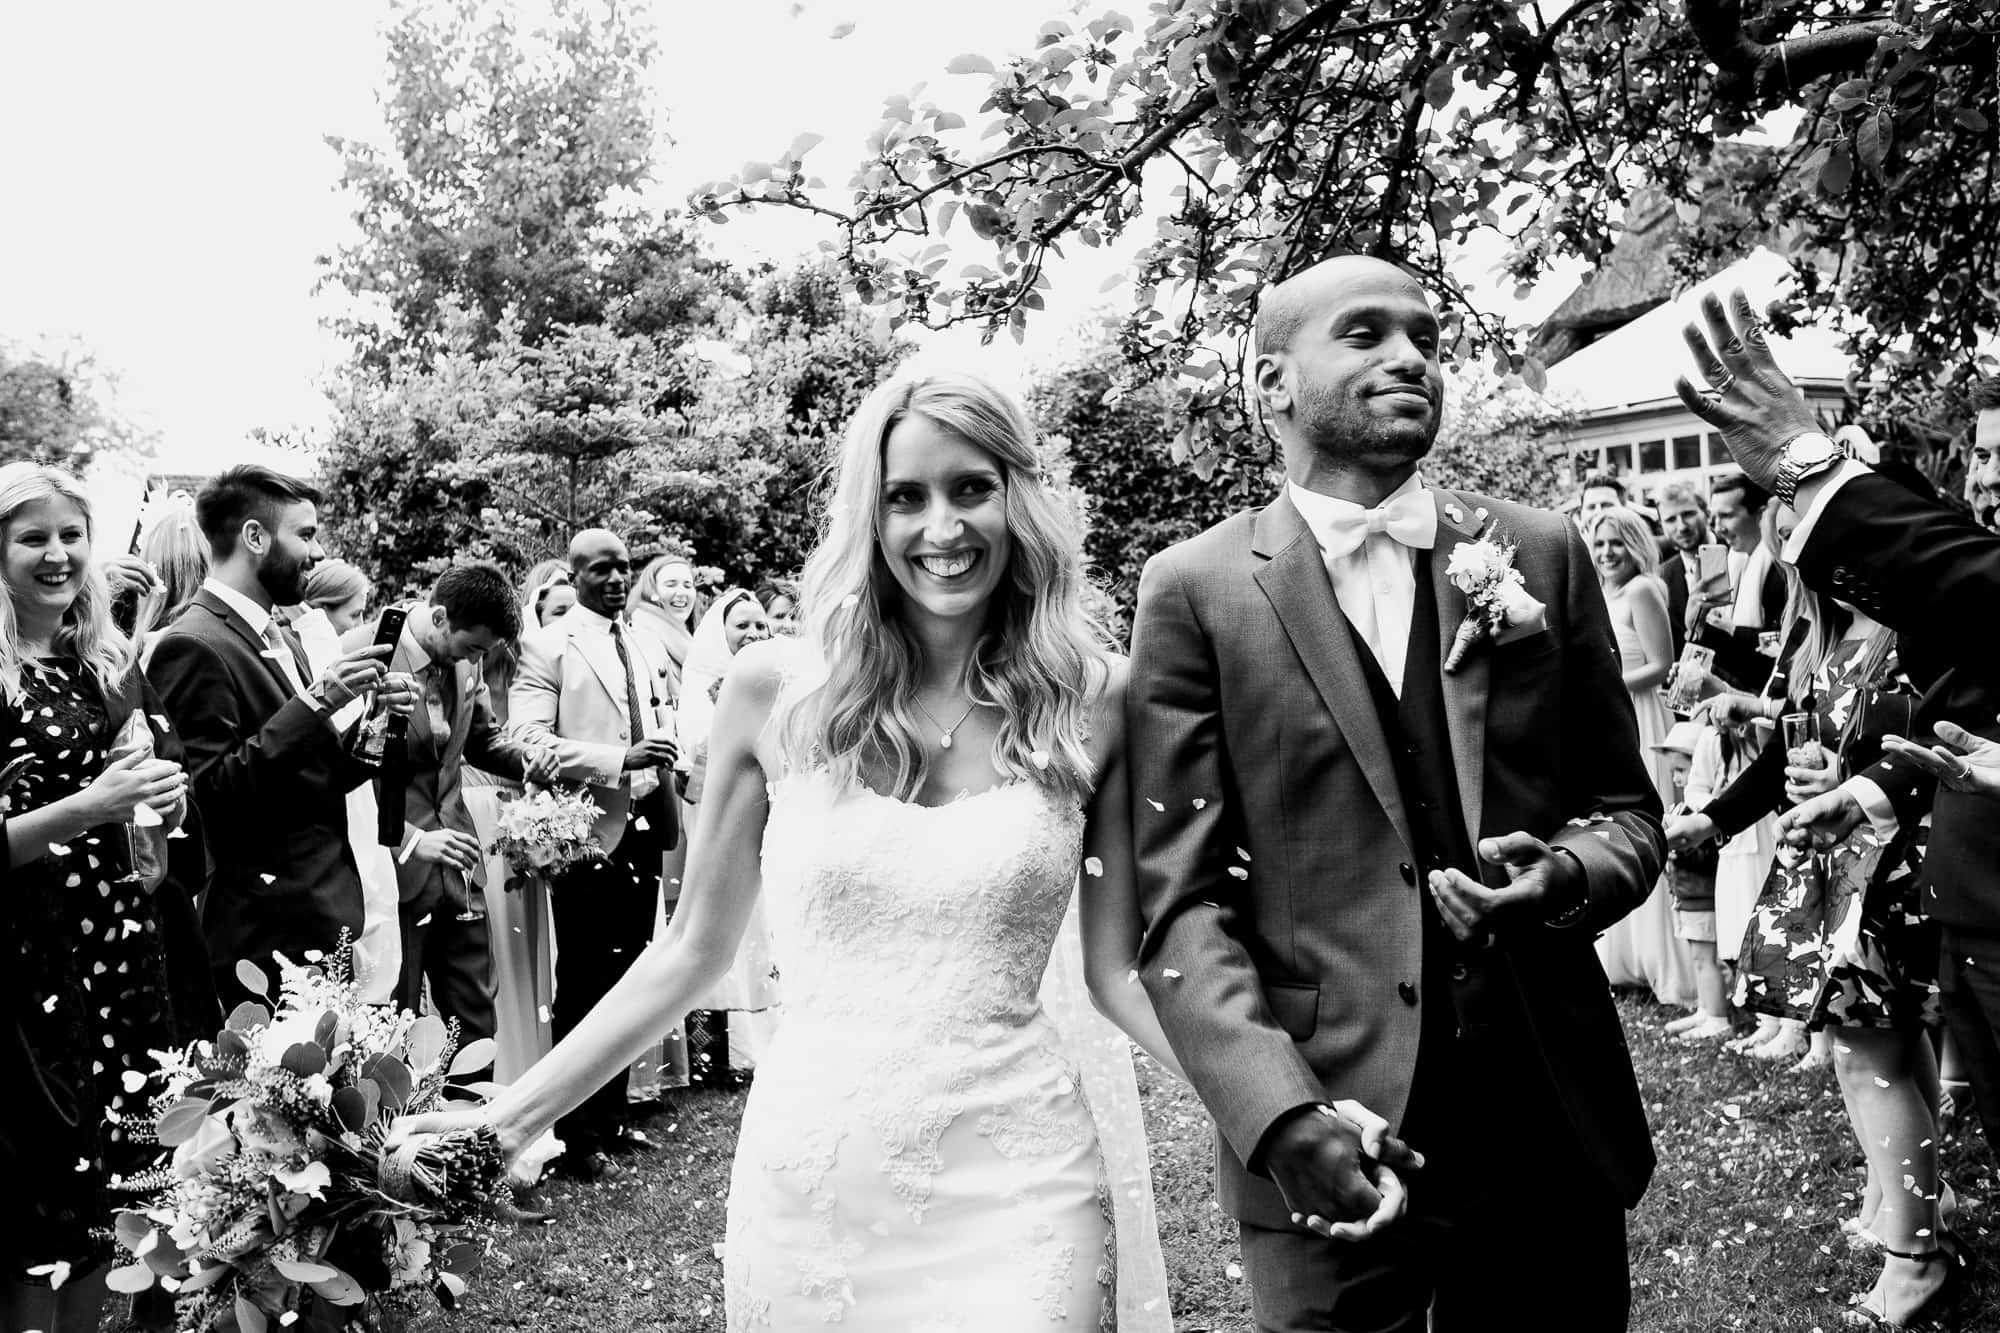 marleybrook-house-wedding-photography-matt-tyler-0035